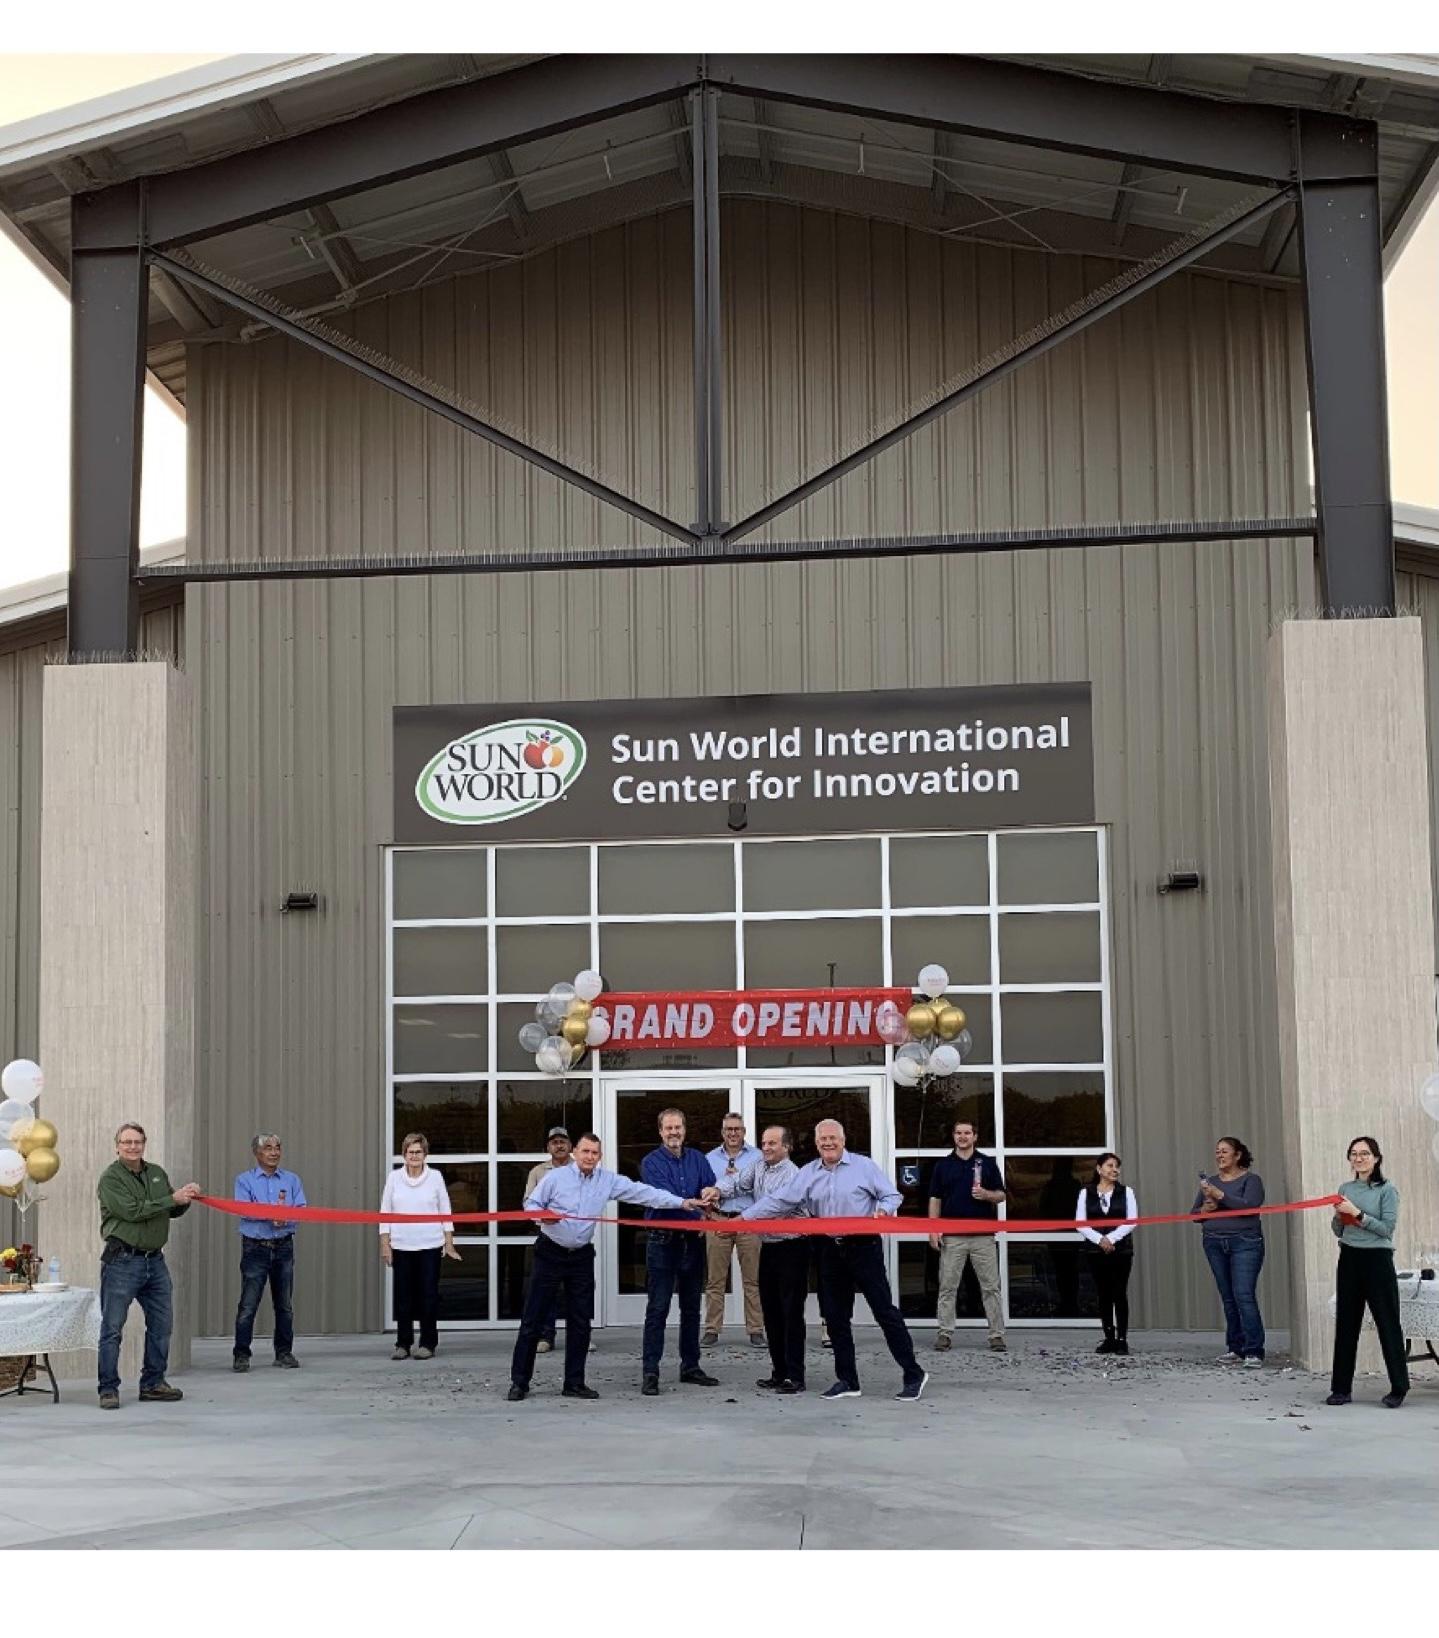 Sun World announces opening of new center for innovation